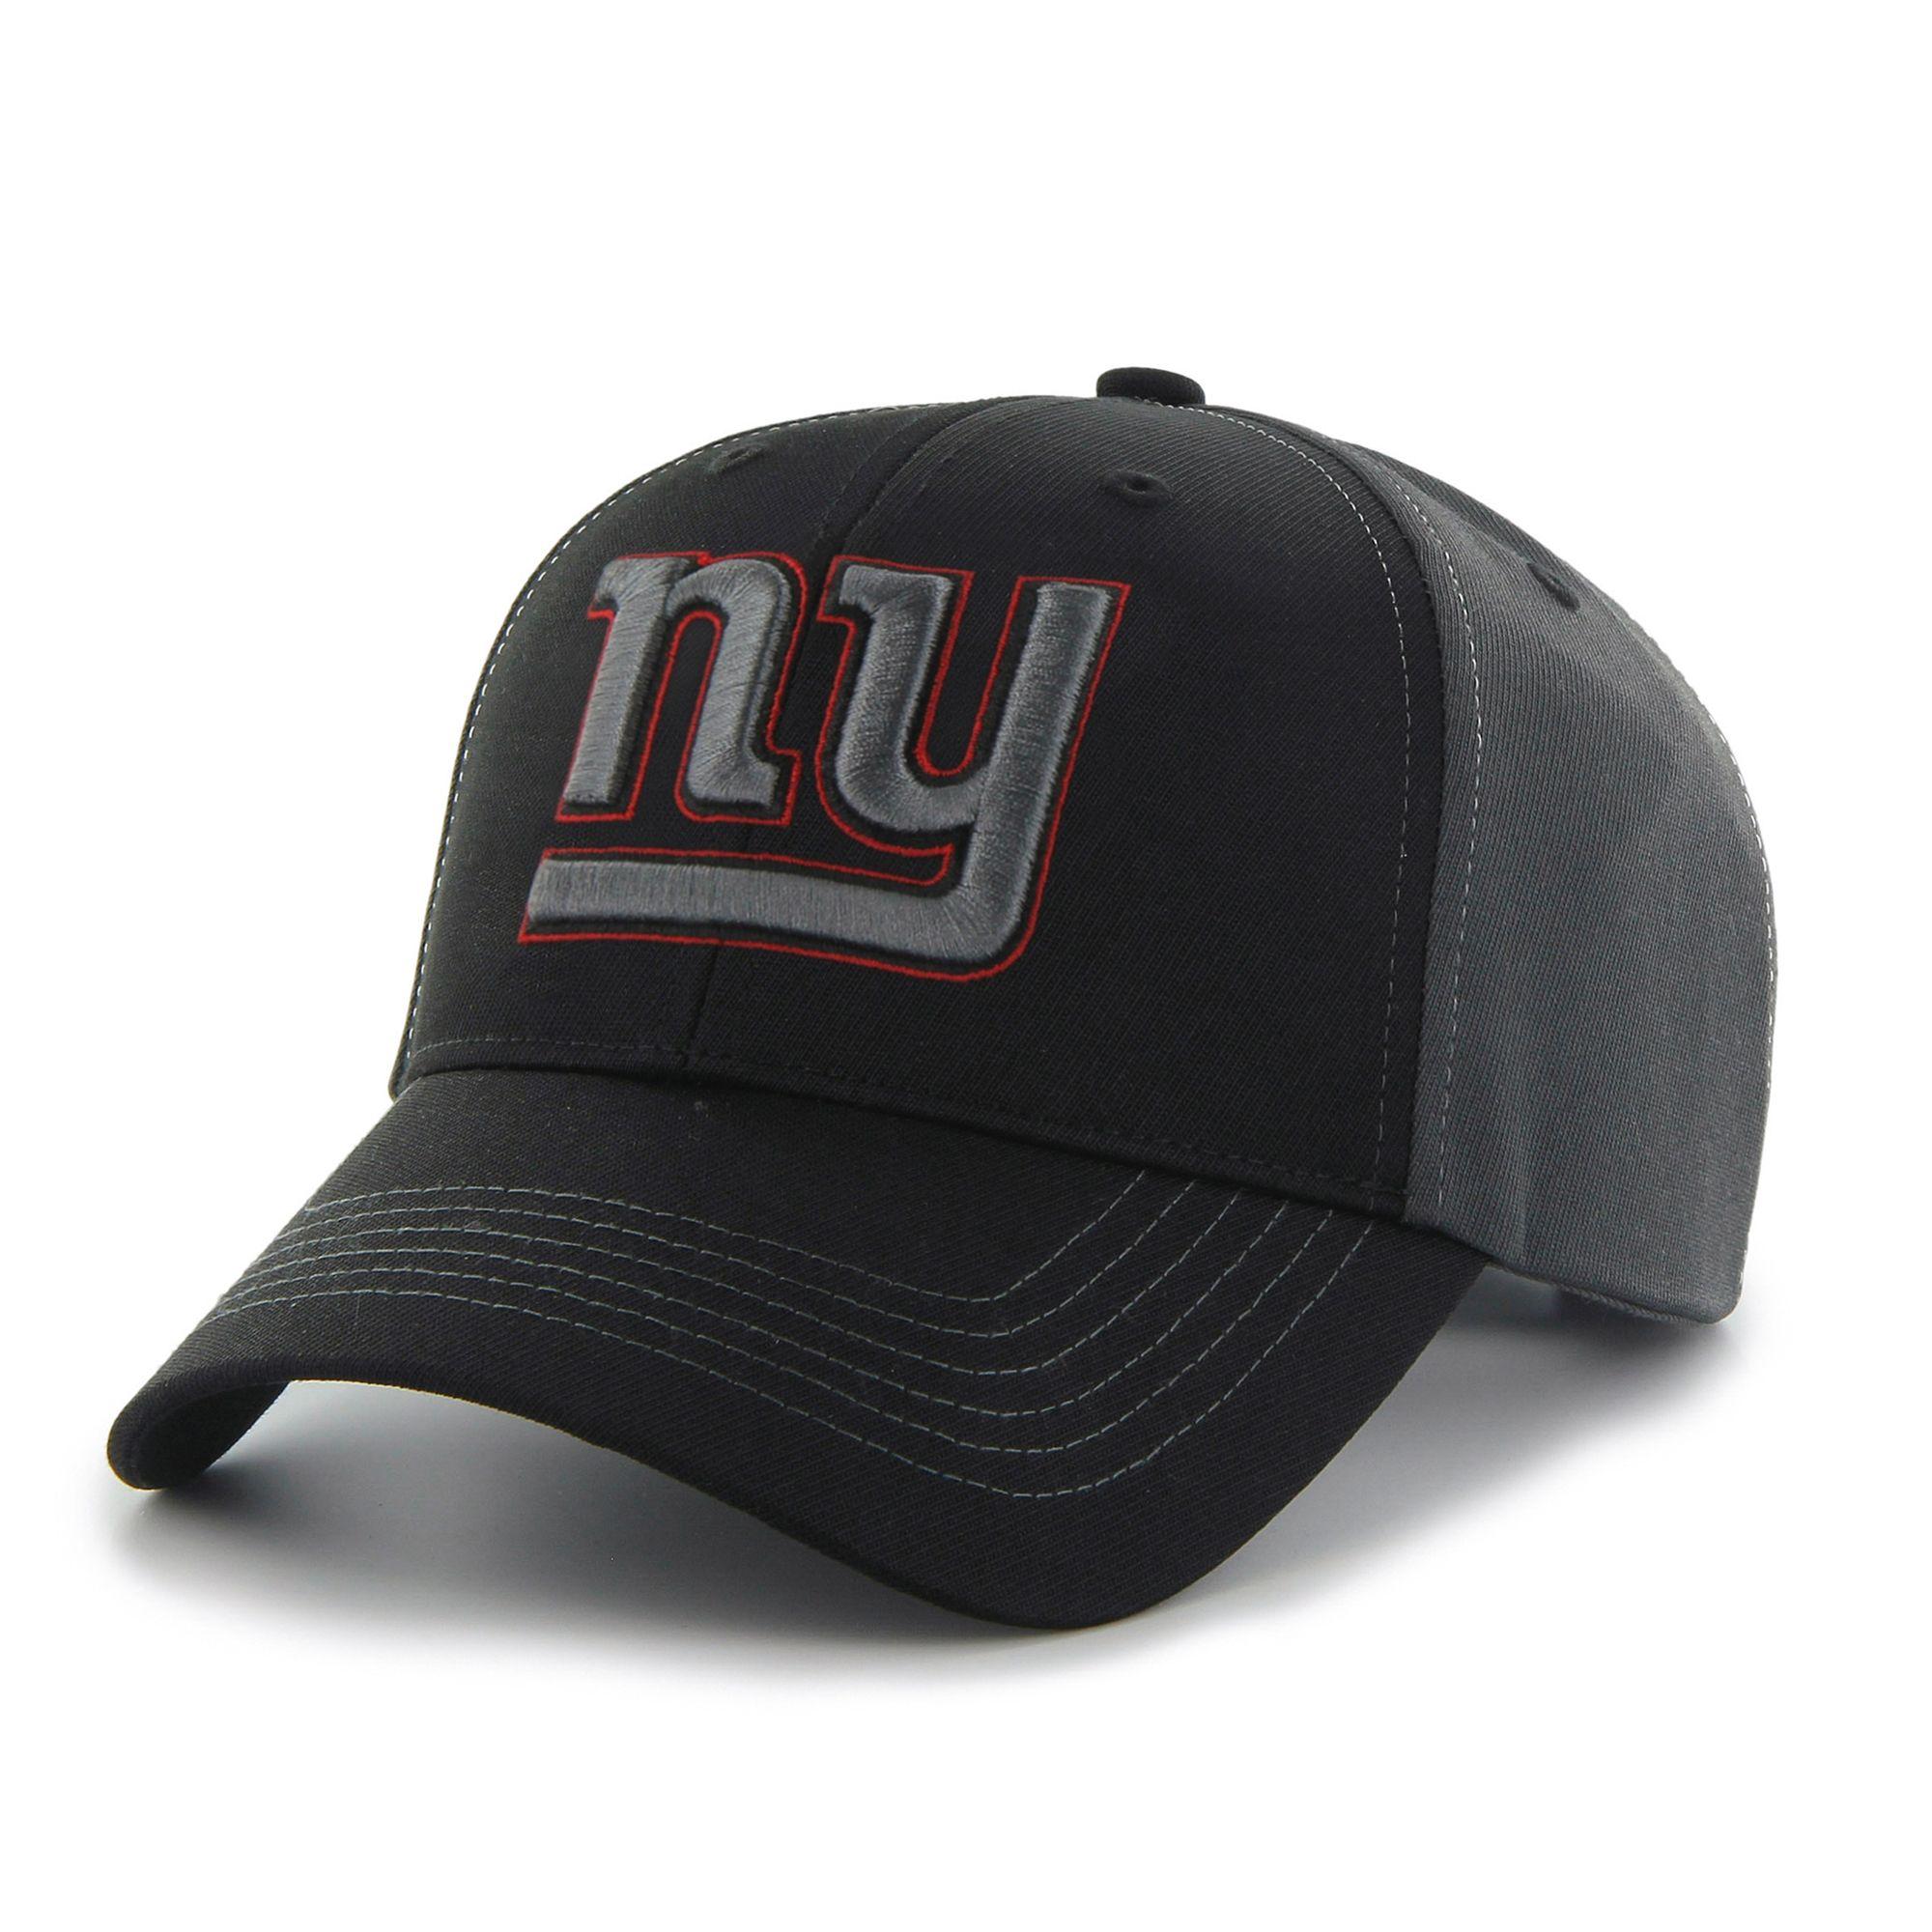 6b54c72ef Fan Favorites NFL New York Giants Blackball Hat, Size: One size, blue/red/ white